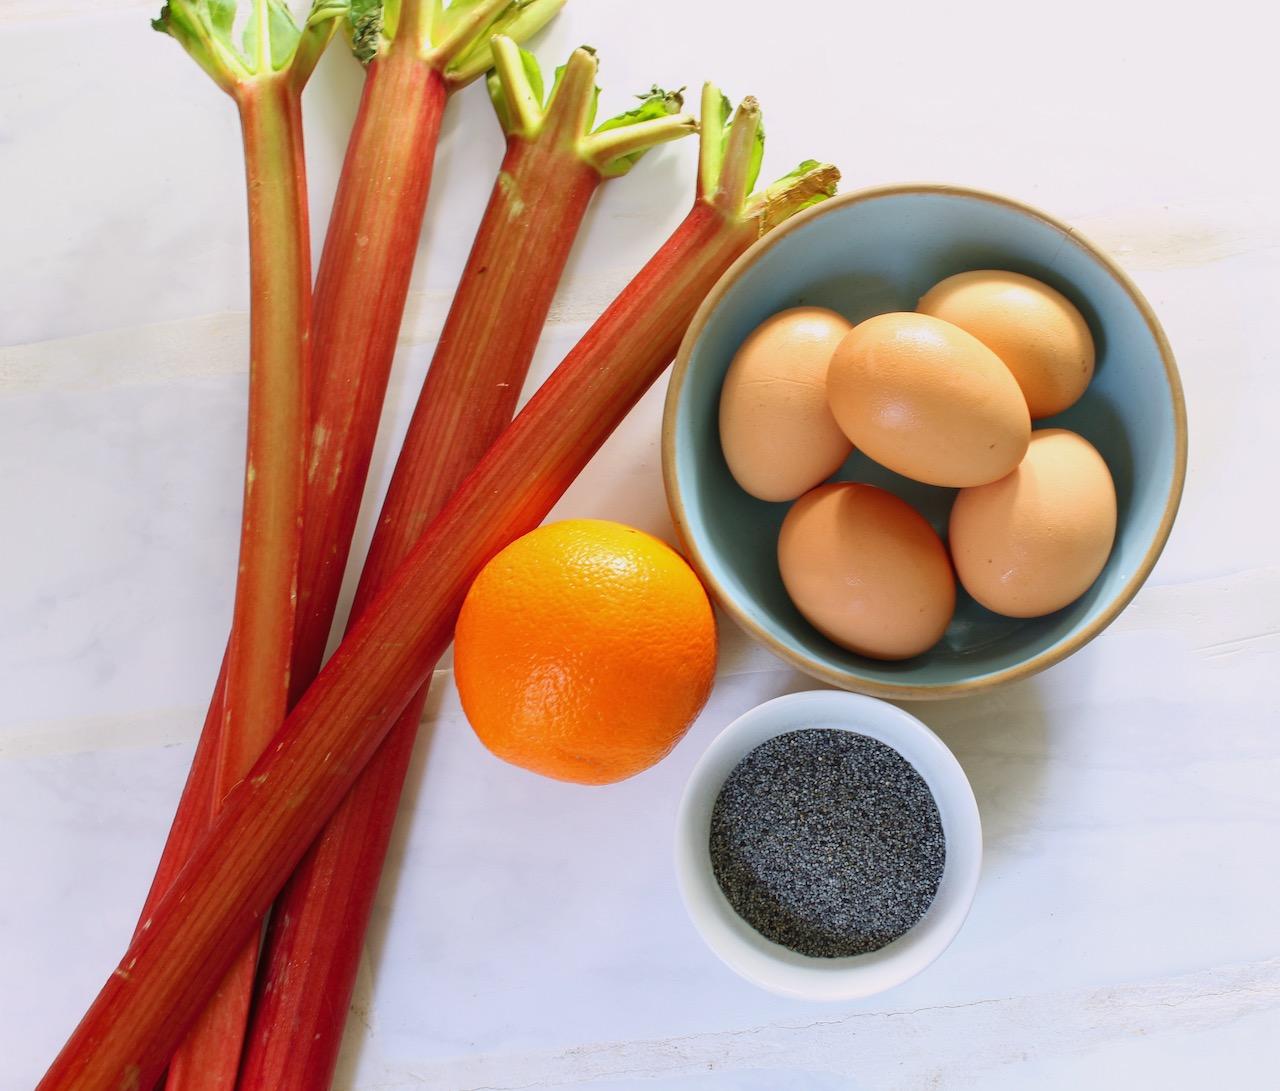 ingredients for rhubarb poppyseed cake